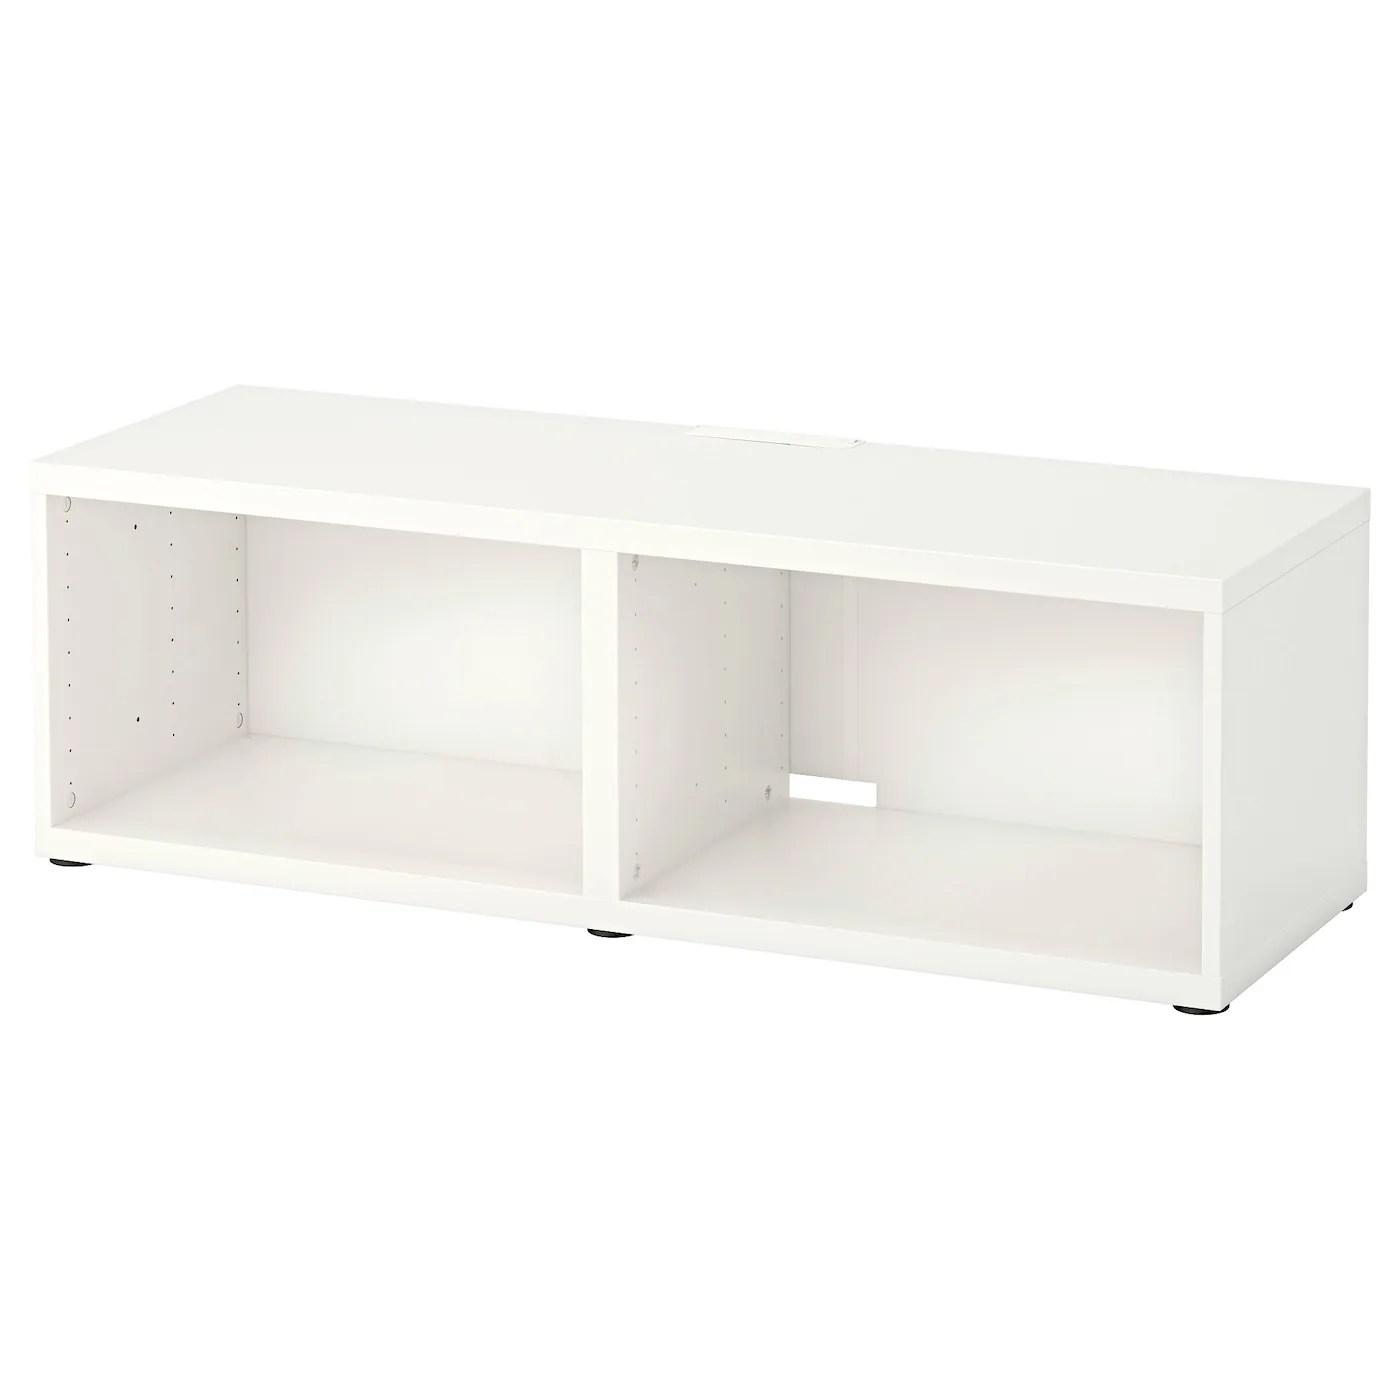 Besta Banc Tv Blanc 120x40x38 Cm Ikea